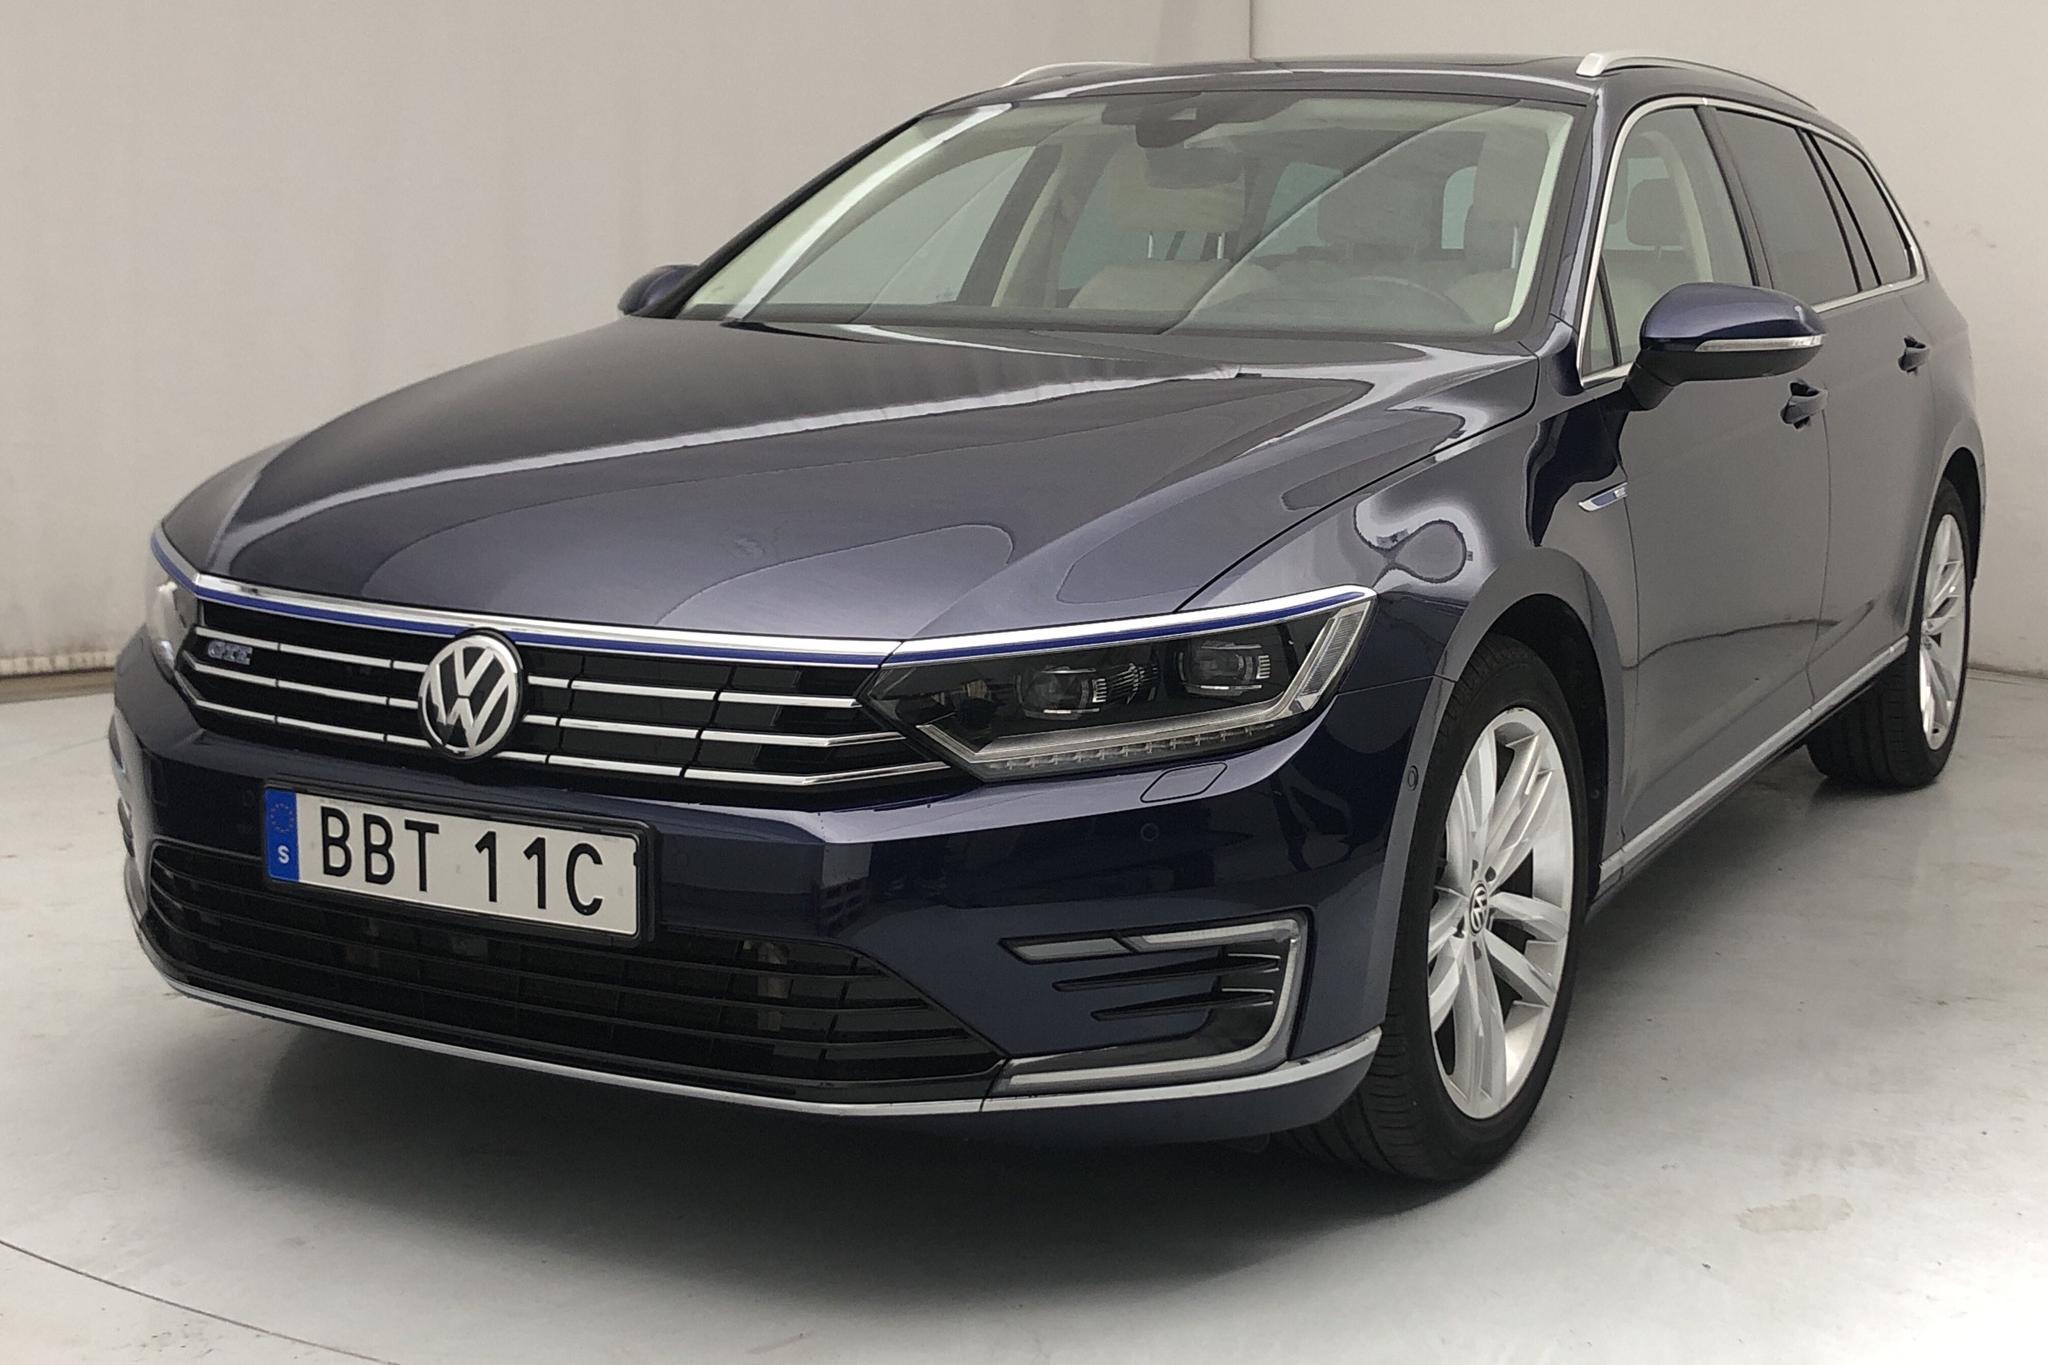 VW Passat 1.4 Plug-in-Hybrid Sportscombi (218hk) - 31 070 km - Automatic - Dark Blue - 2018